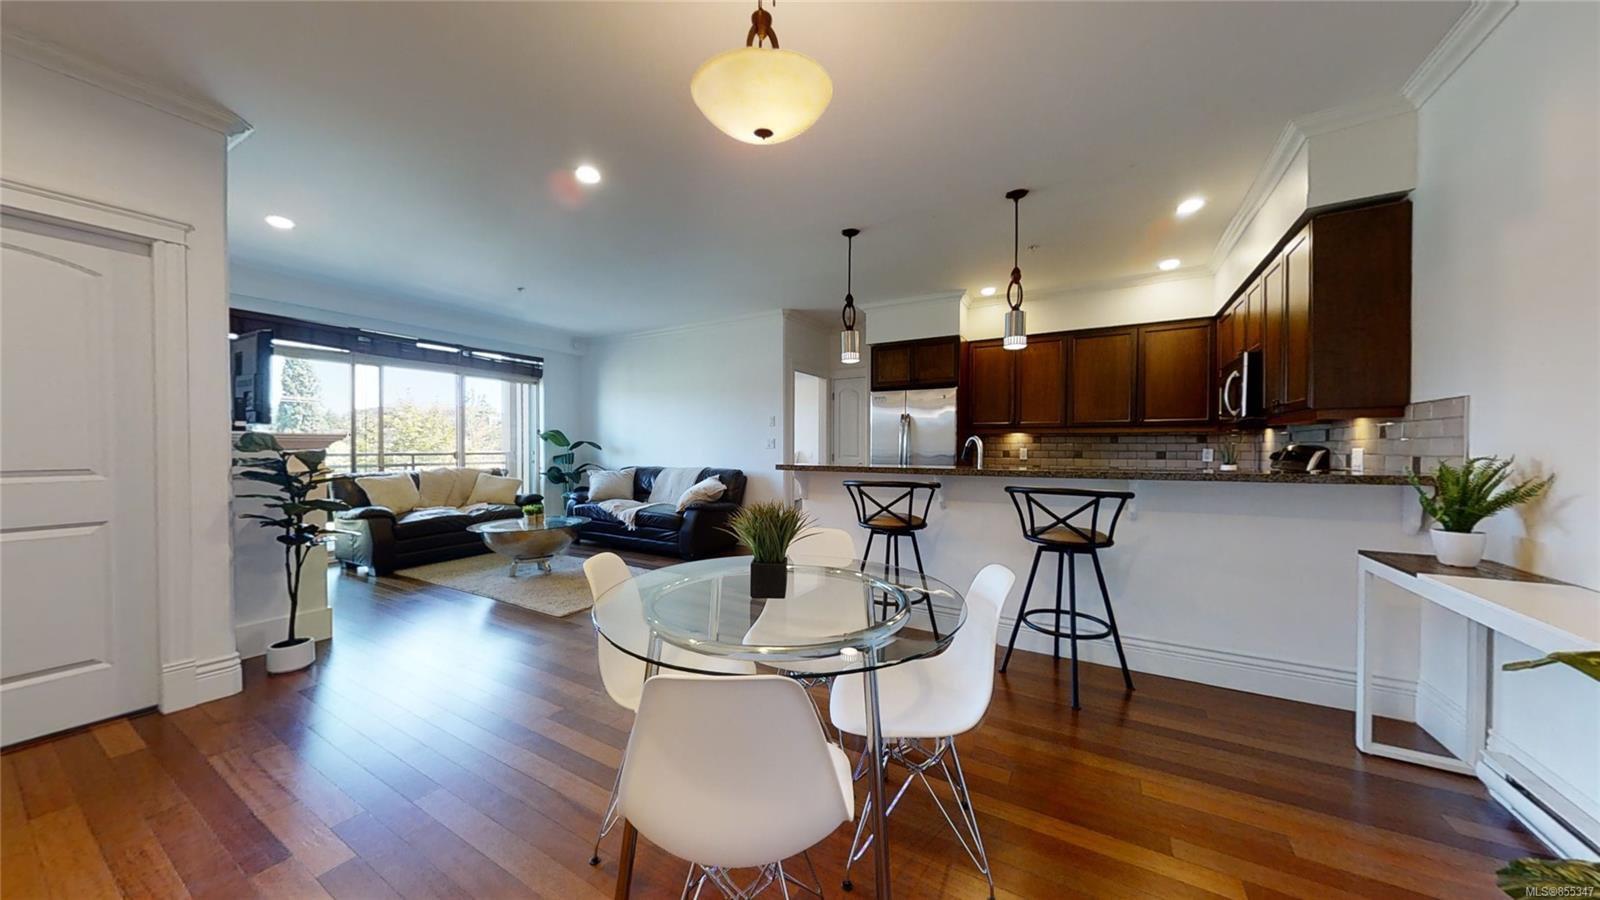 Main Photo: 302 755 Goldstream Ave in : La Langford Proper Condo for sale (Langford)  : MLS®# 855347